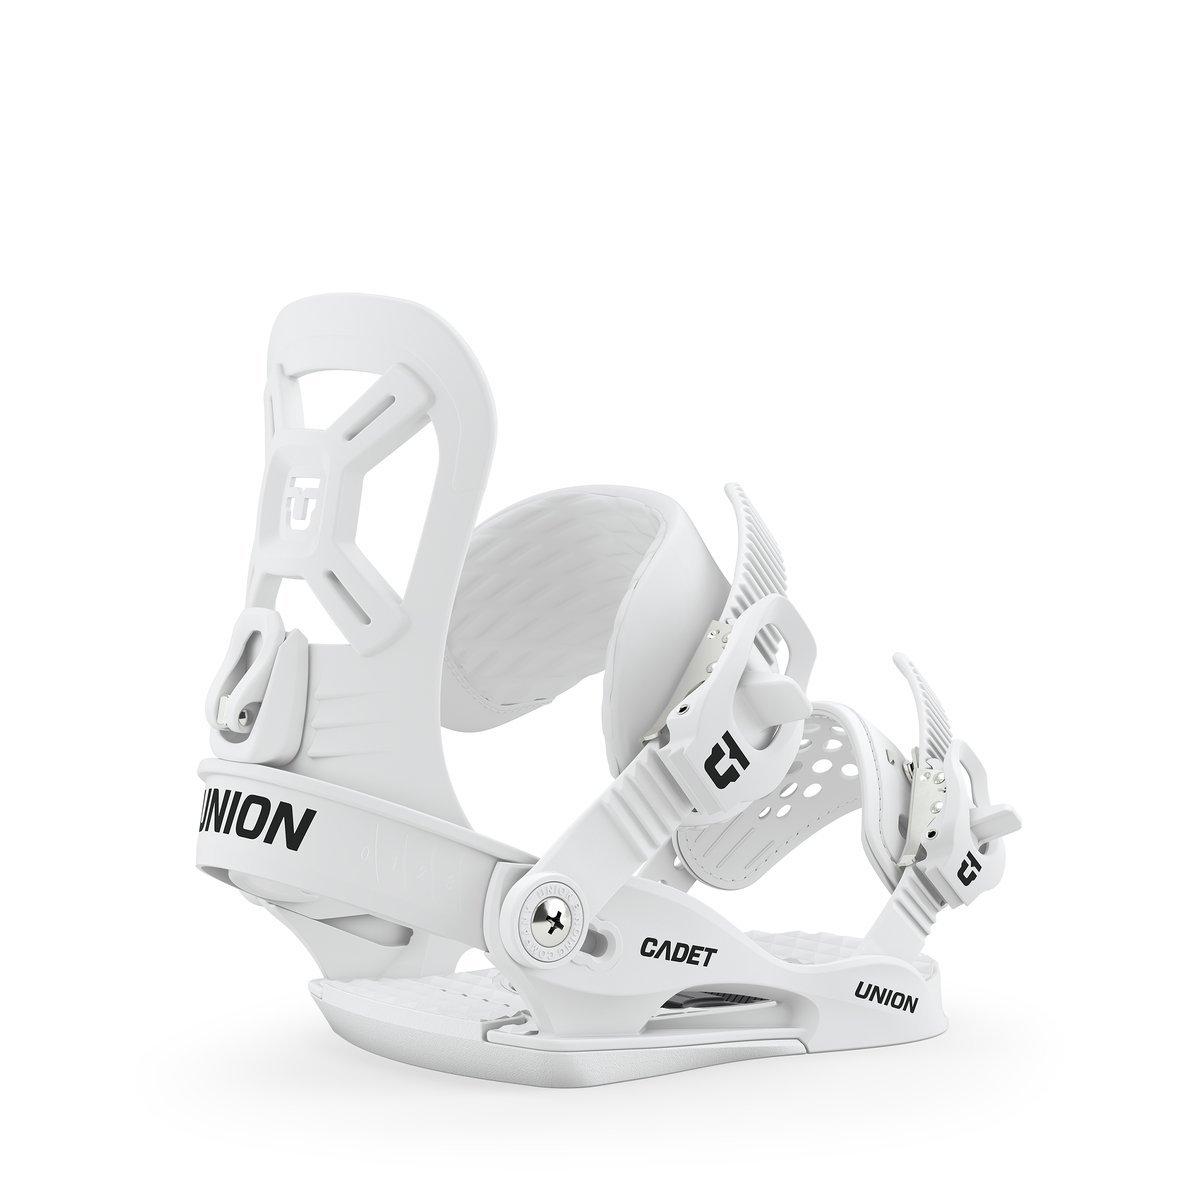 Union Cadet XS Snowboard Bindings - White